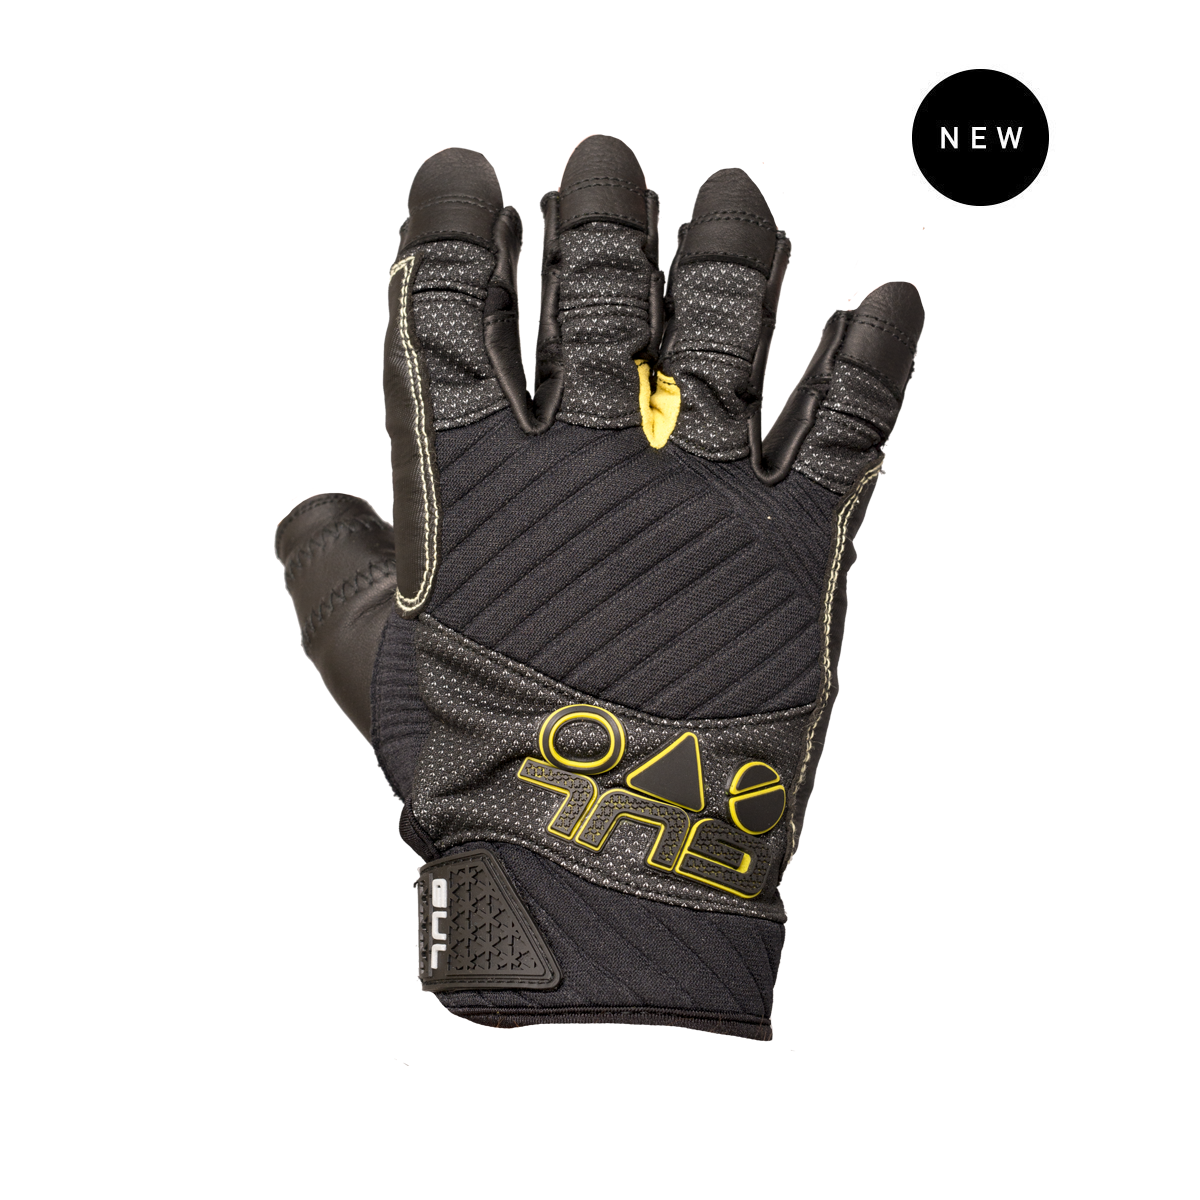 Evo Pro Short Finger Glove   Gl1299-B4